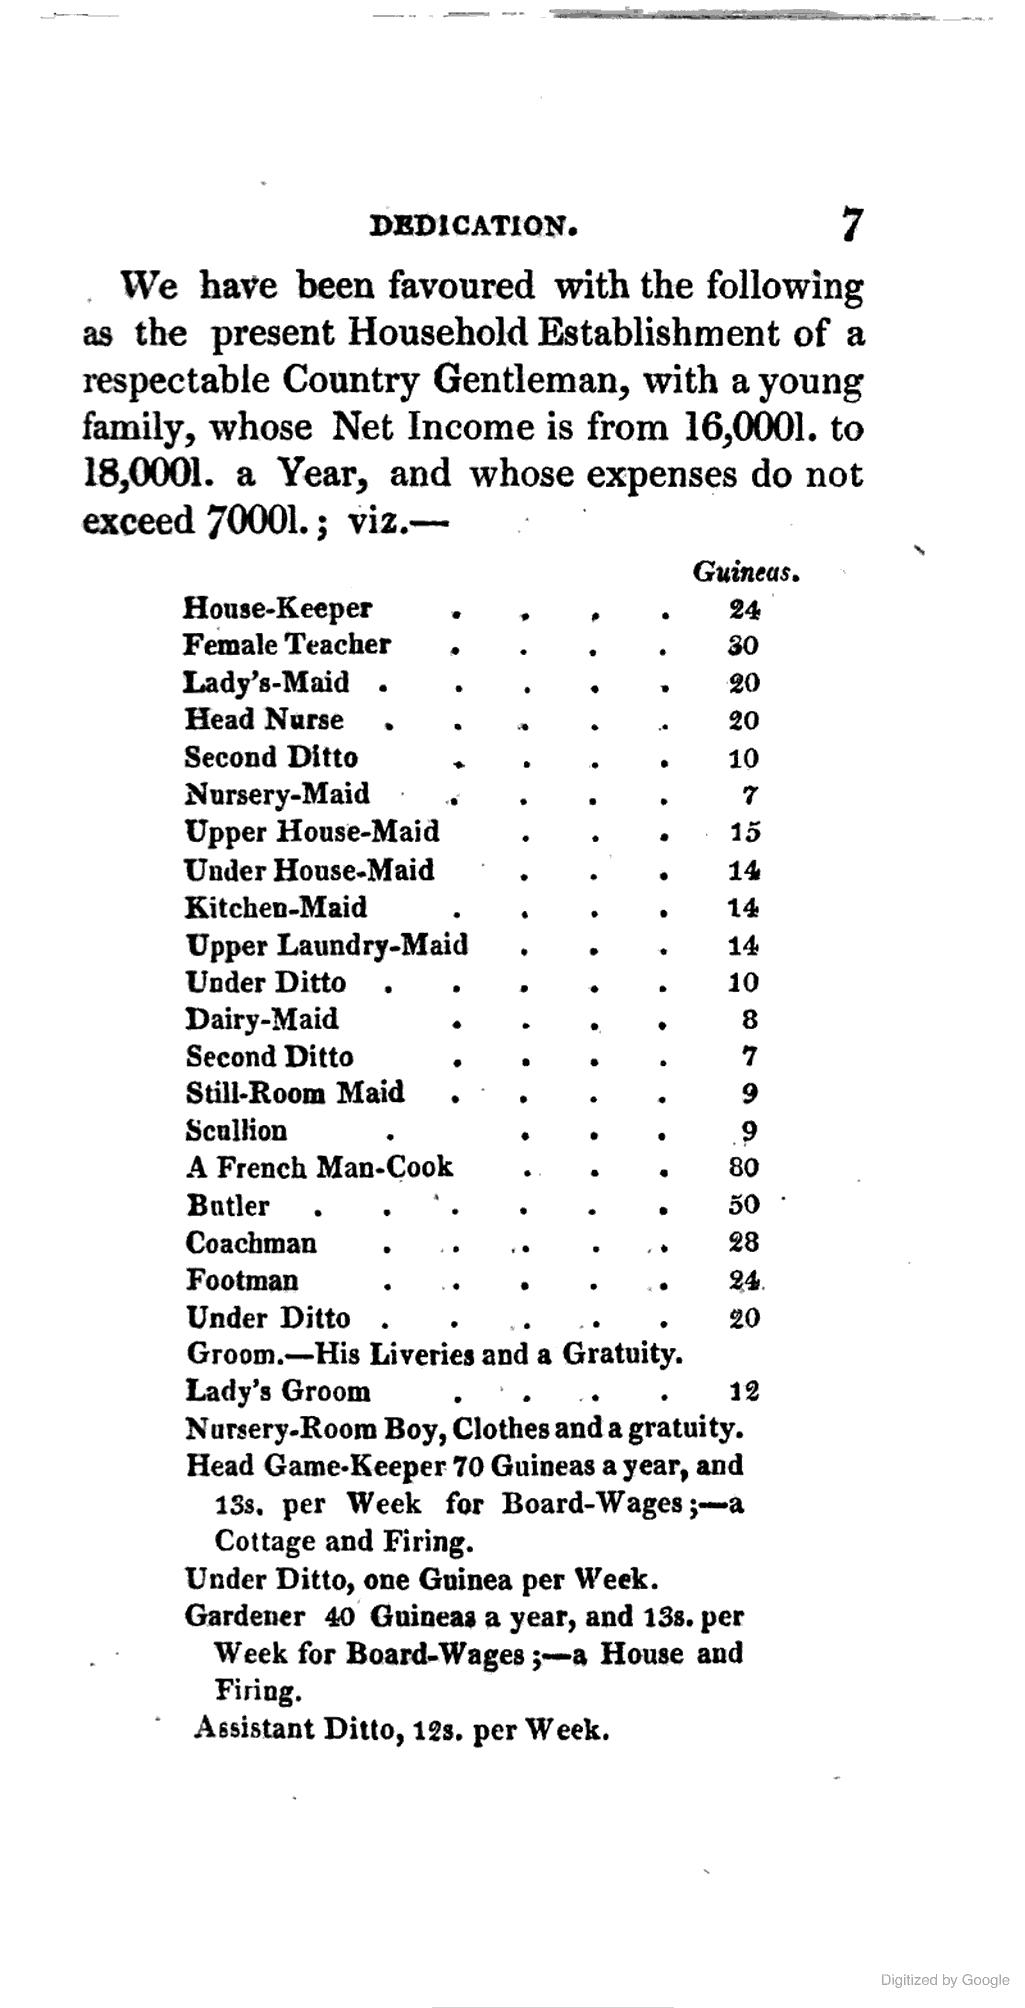 The Complete Servant Salary Of Servants In 1823 Servant